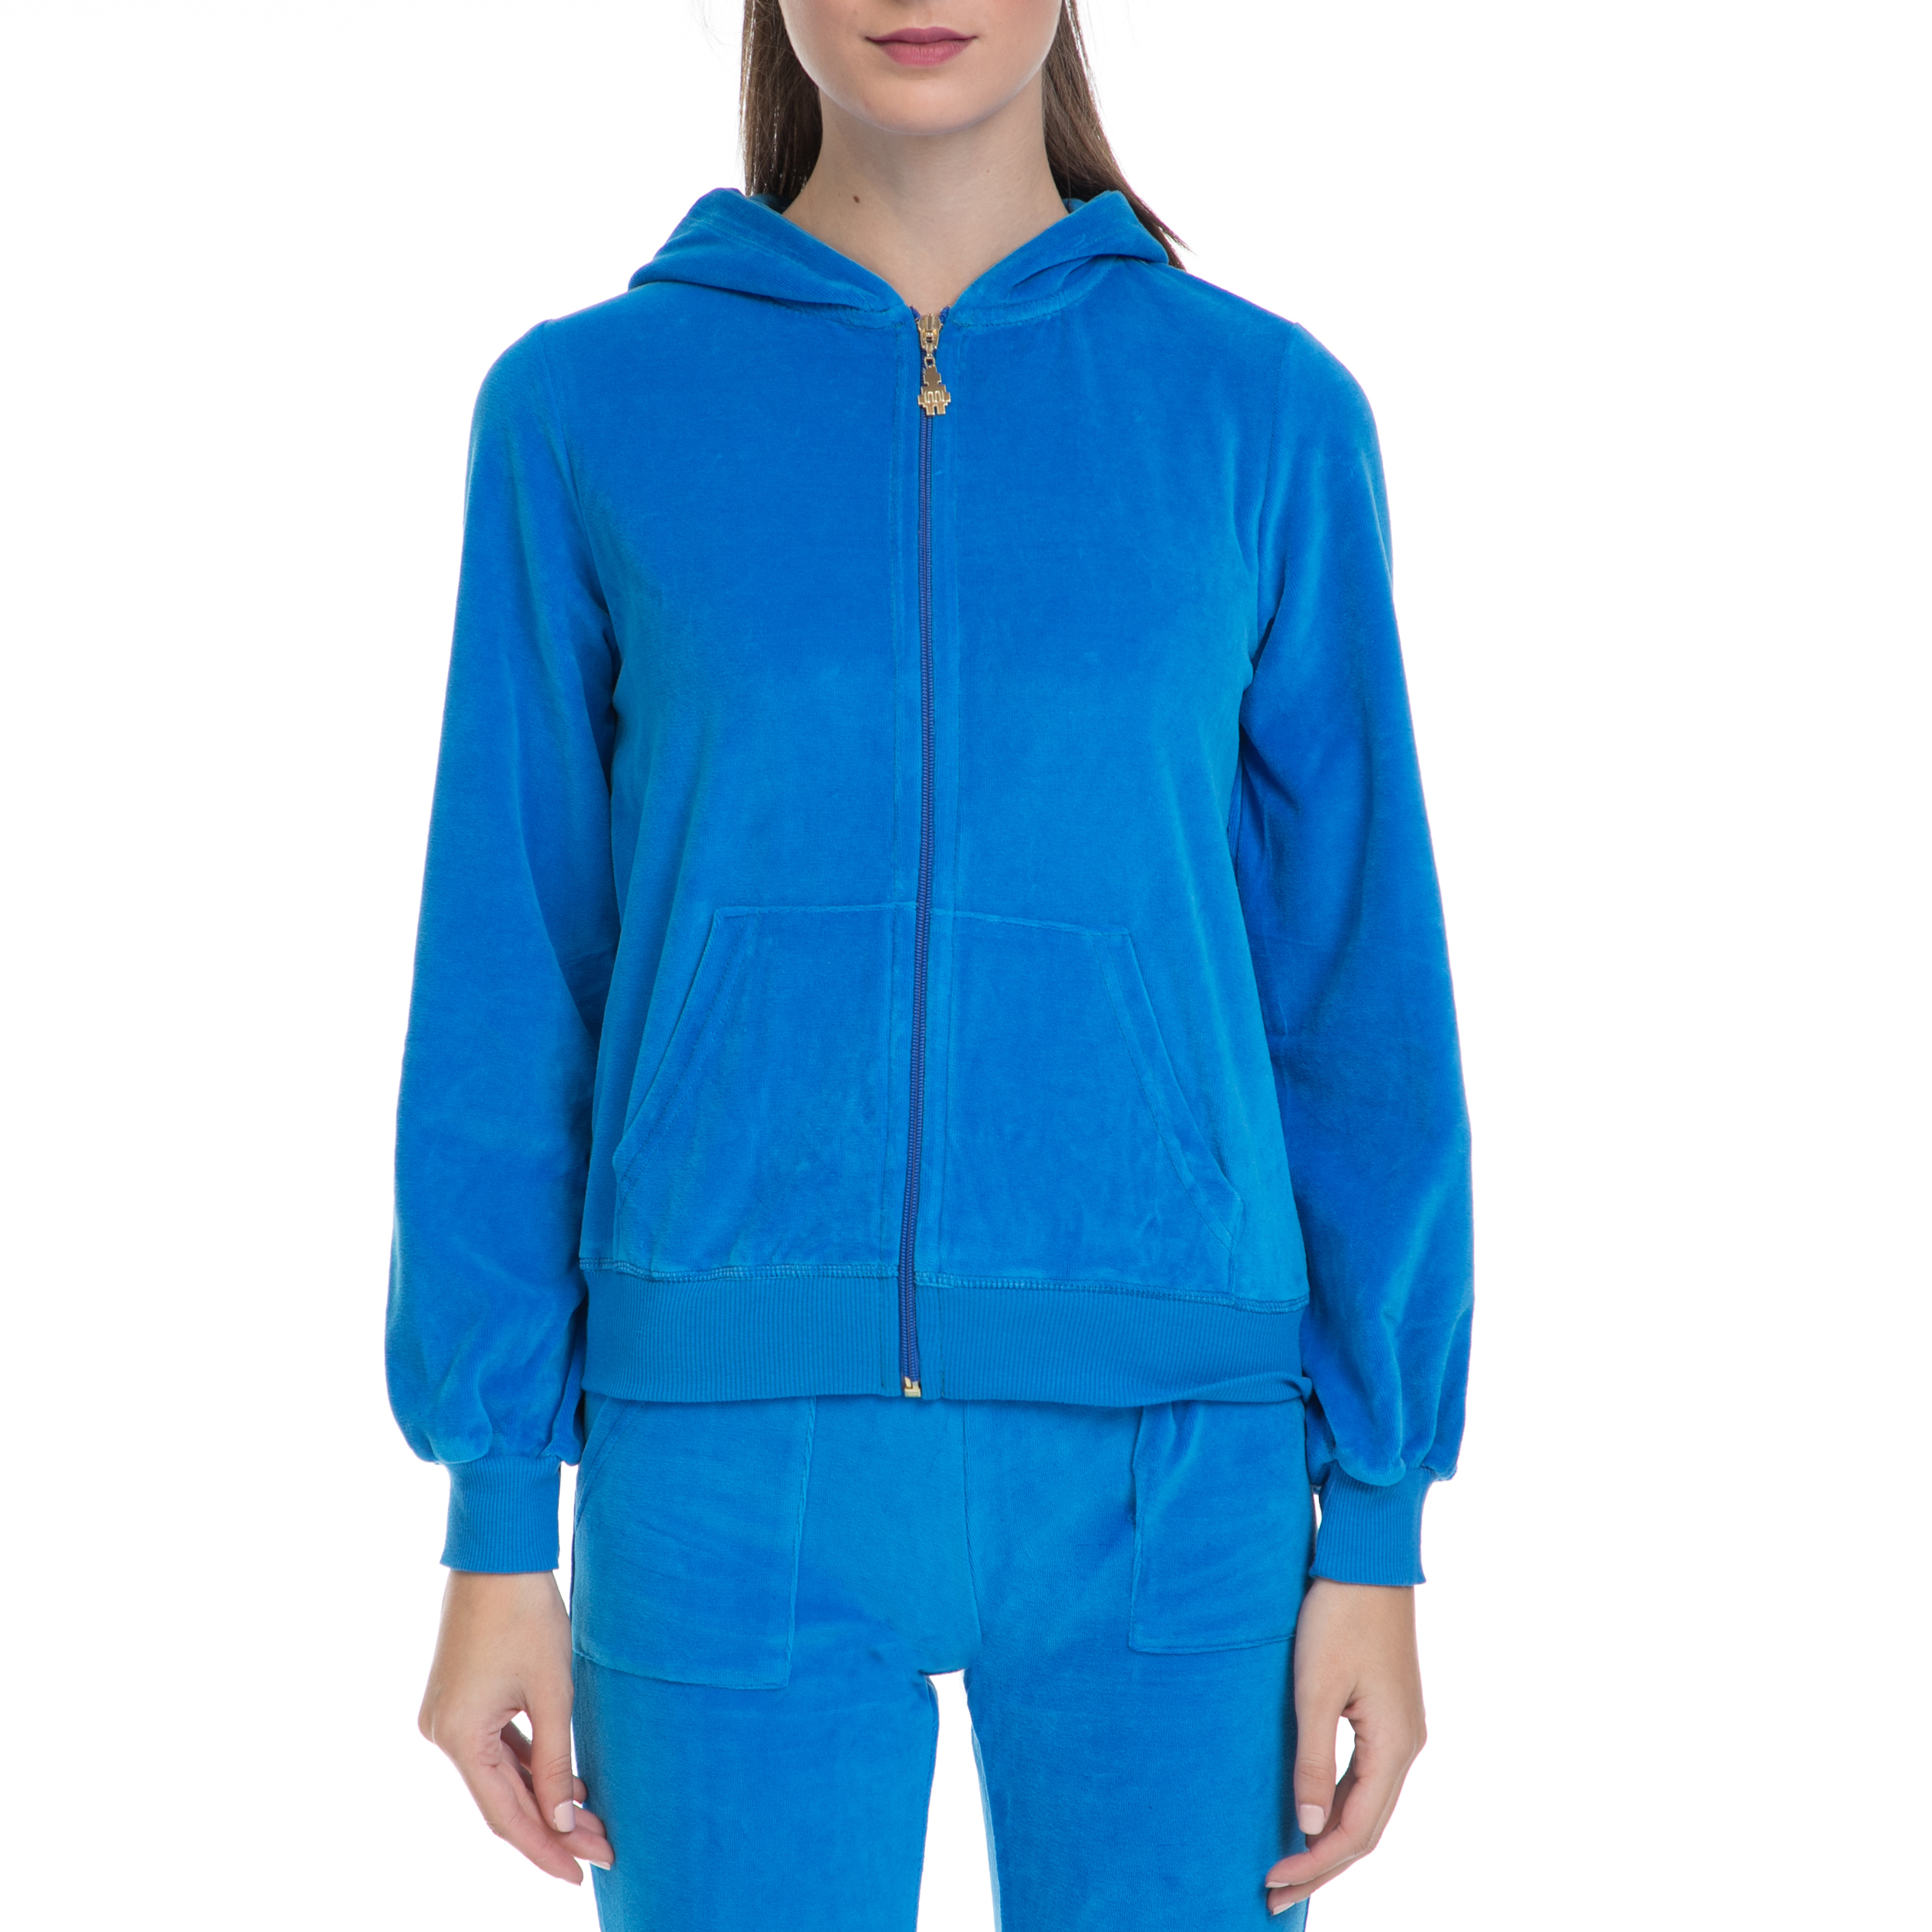 MYMOO - Γυναικεία ζακέτα MYMOO μπλε γυναικεία ρούχα φούτερ ζακέτες